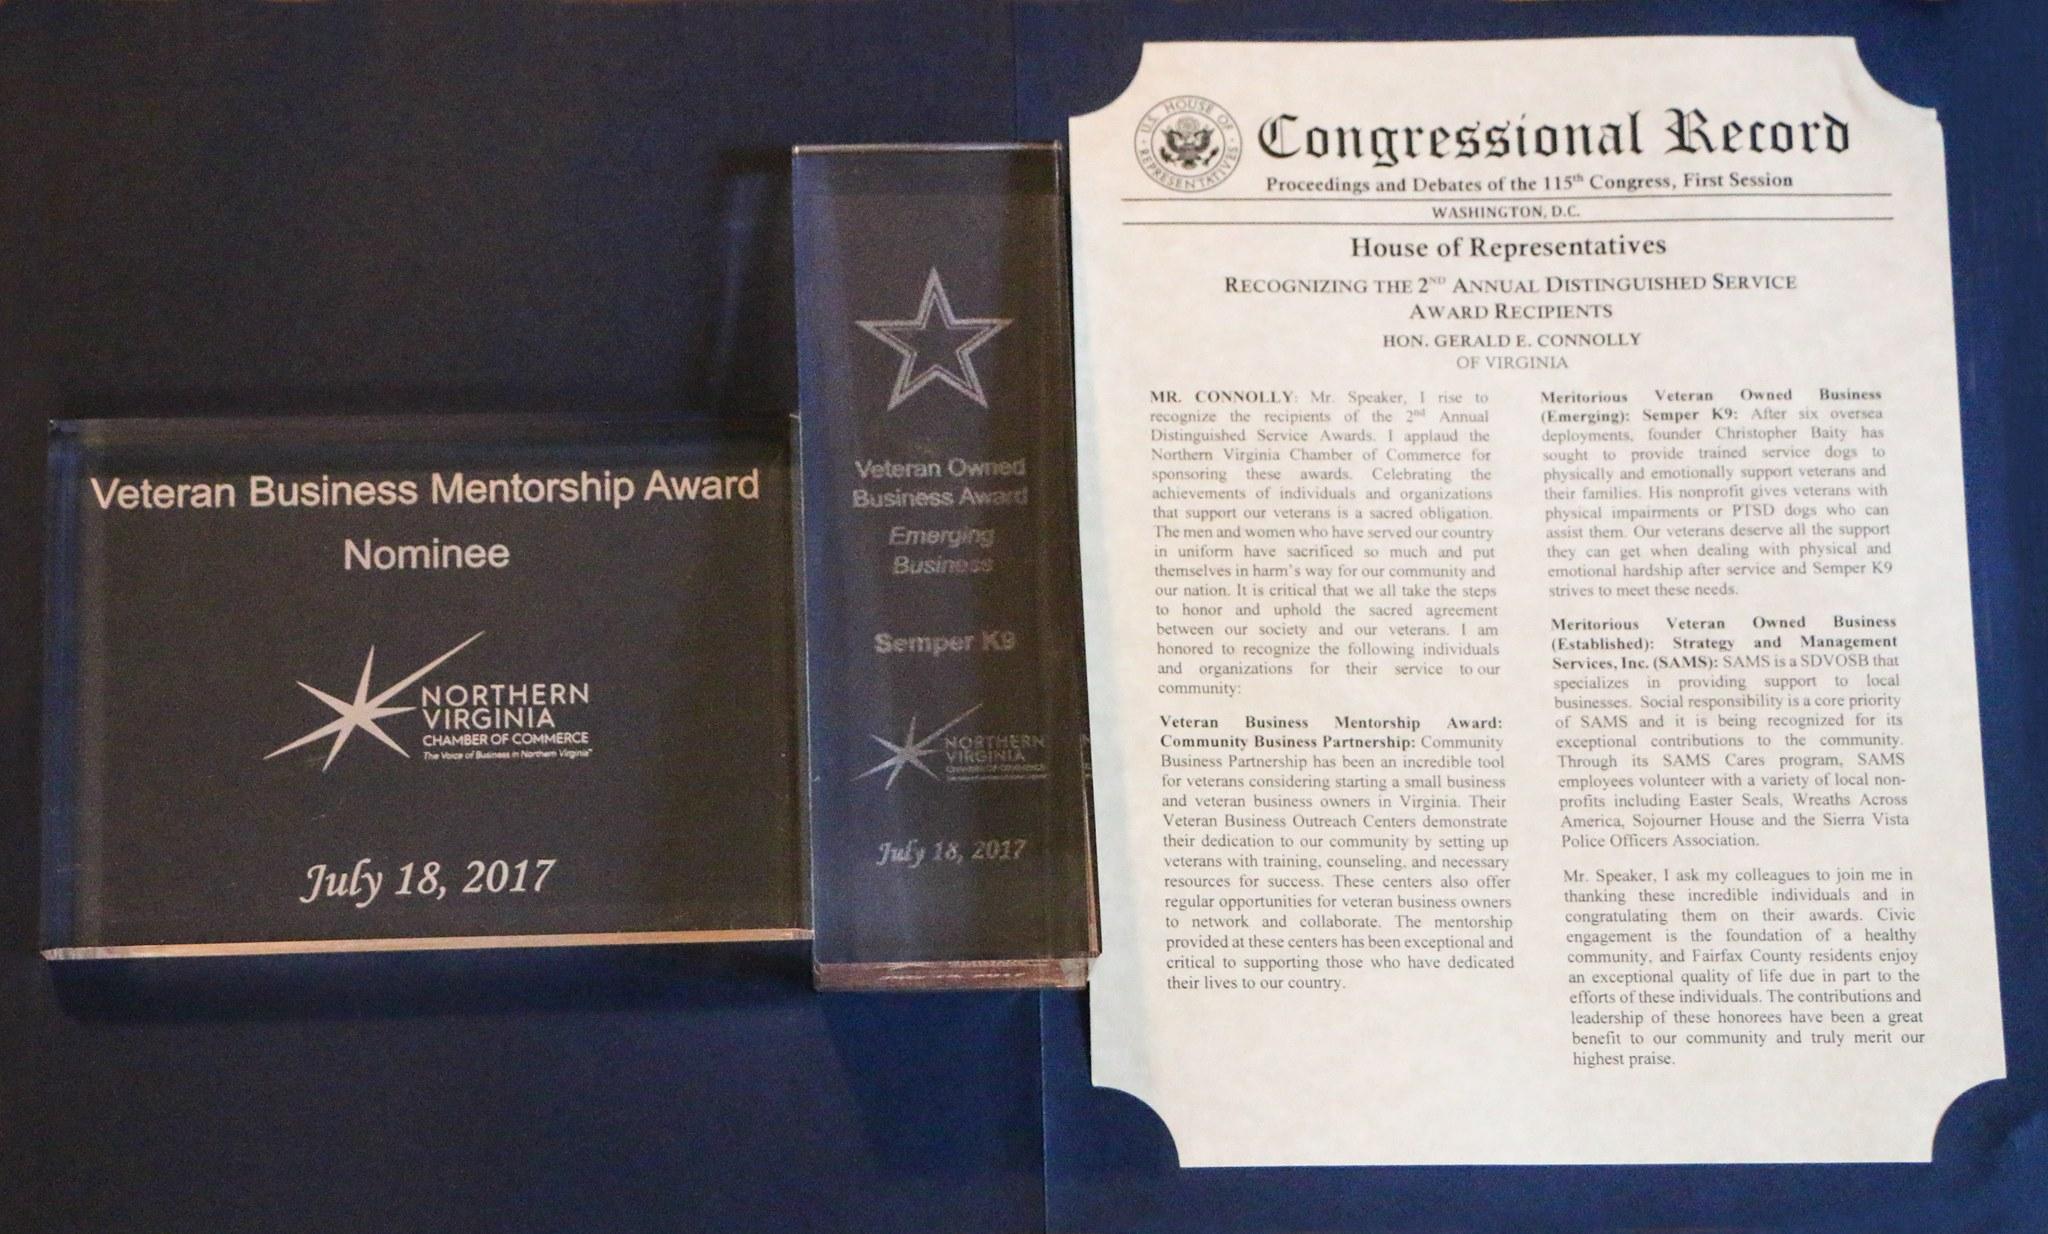 Semper K9 Wins NOVA Chamber of Comerce Emerging Veteran Owned Business Award